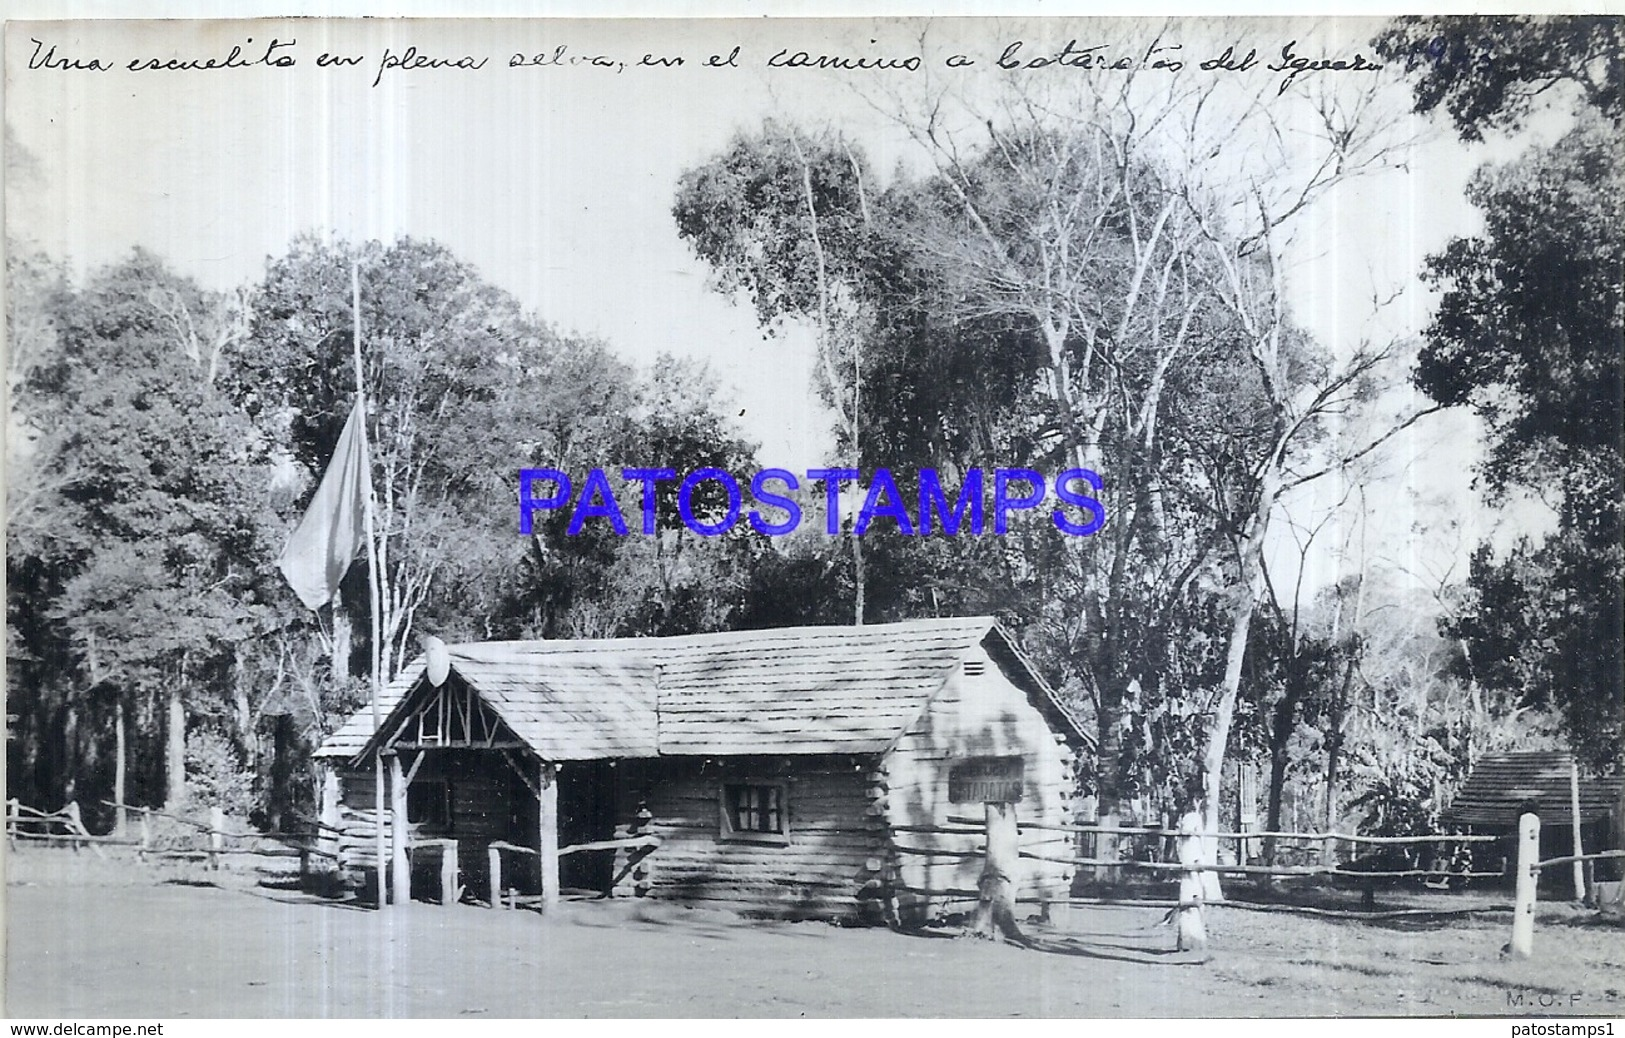 118462 ARGENTINA MISIONES CATARATAS DEL IGUAZU PARQUES NACIONALES ESCUELITA 16.5 X 10 CM PHOTO NO POSTCARD - Fotografie